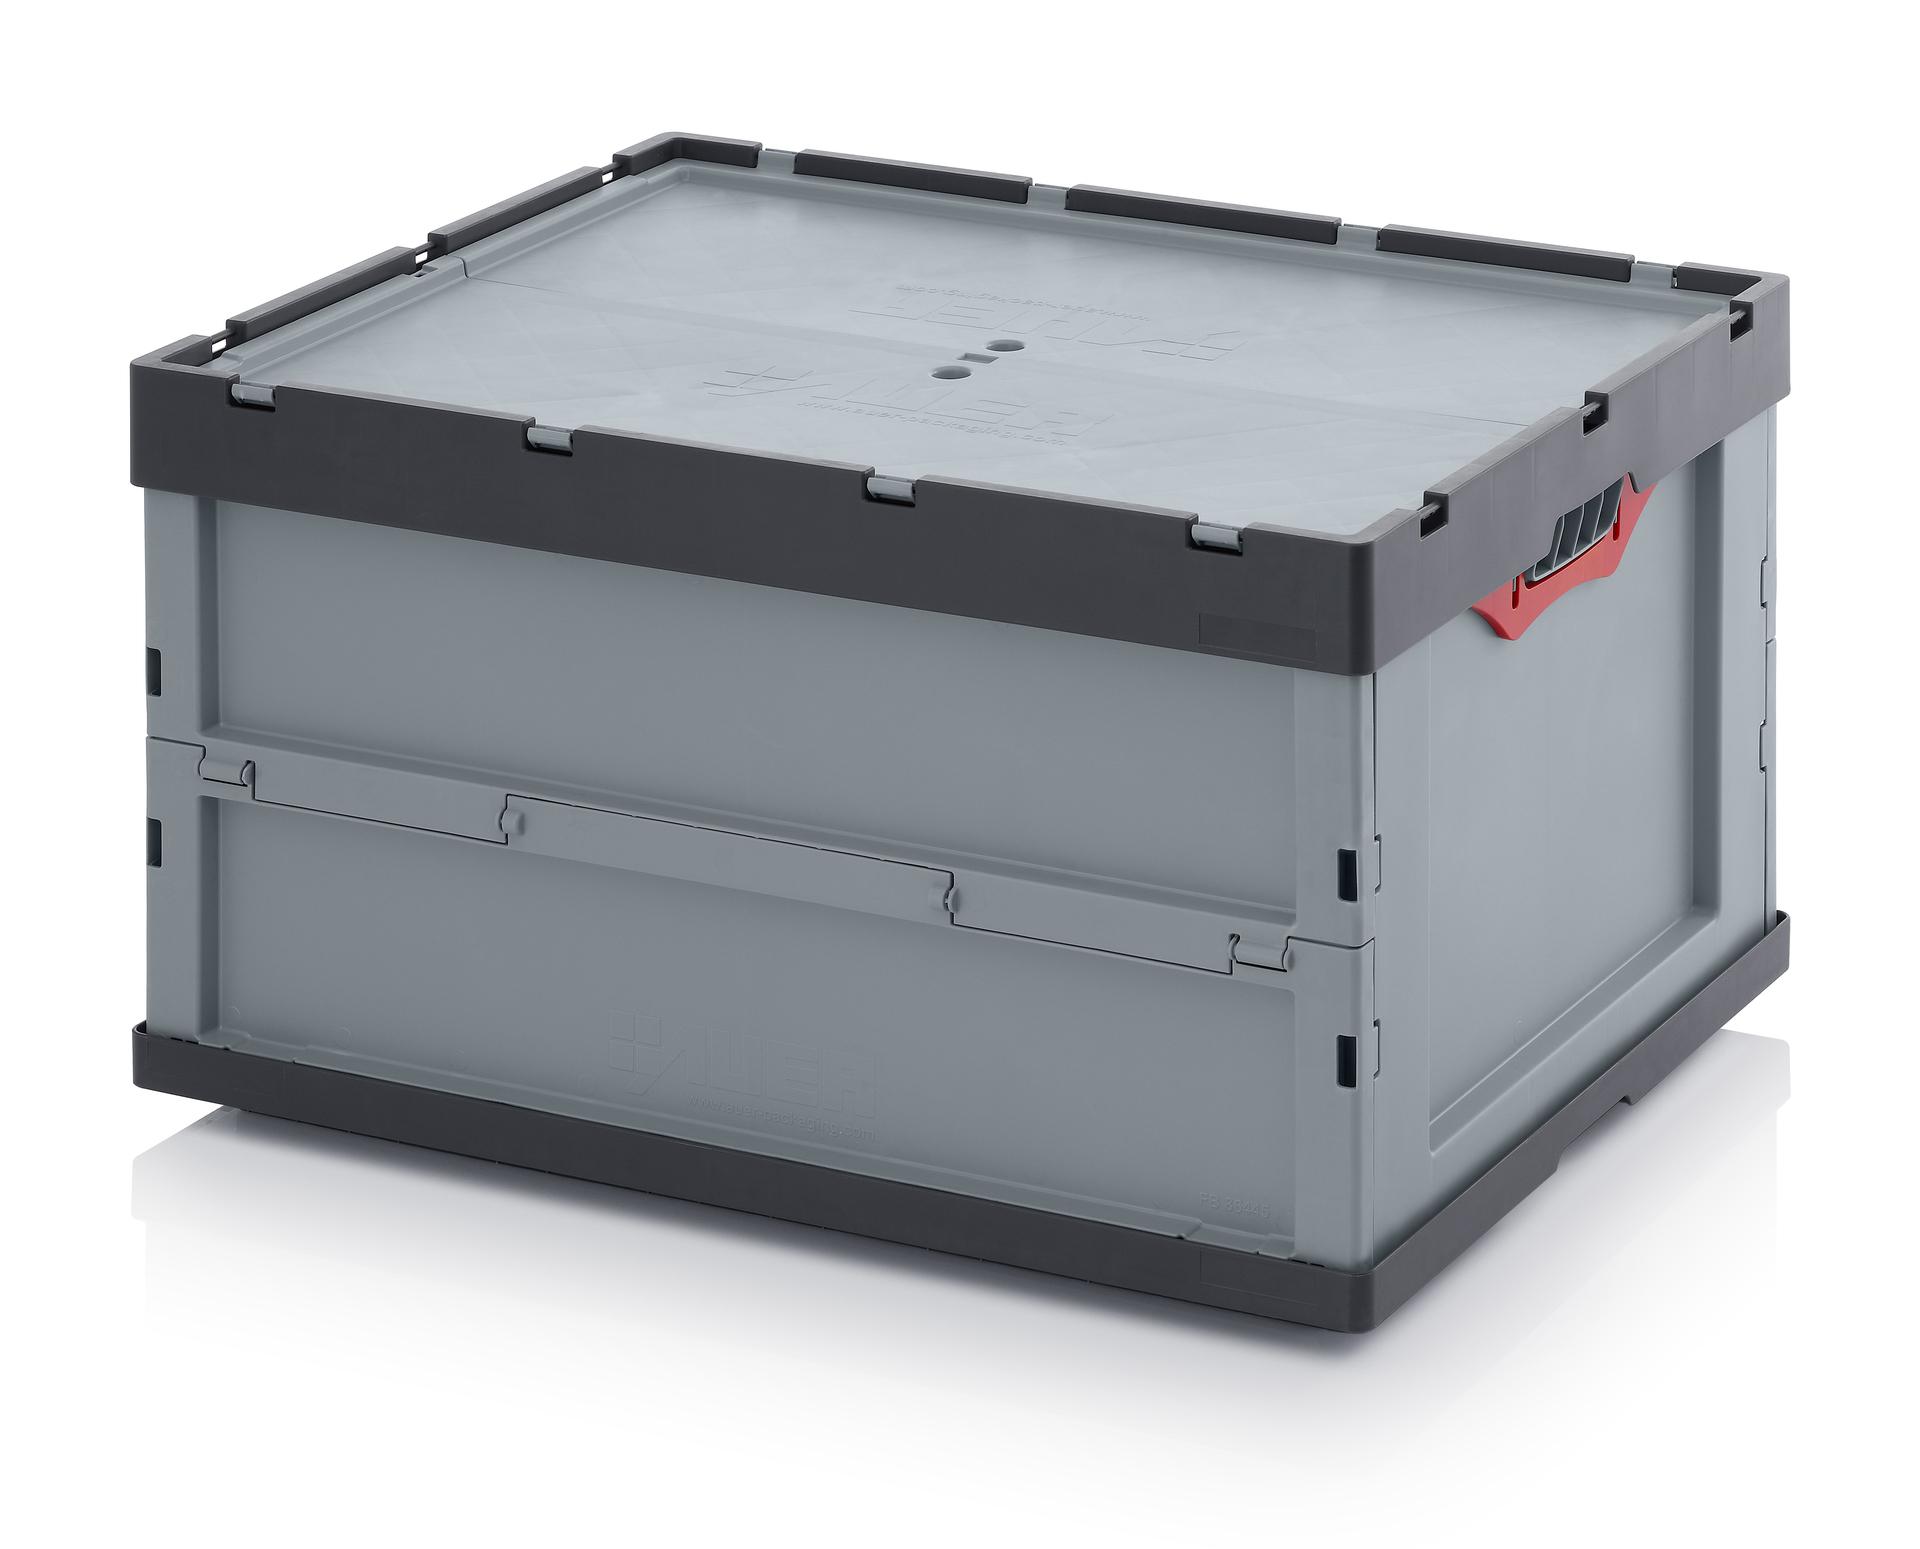 faltboxen mit deckel fbd 86 445 auer packaging. Black Bedroom Furniture Sets. Home Design Ideas